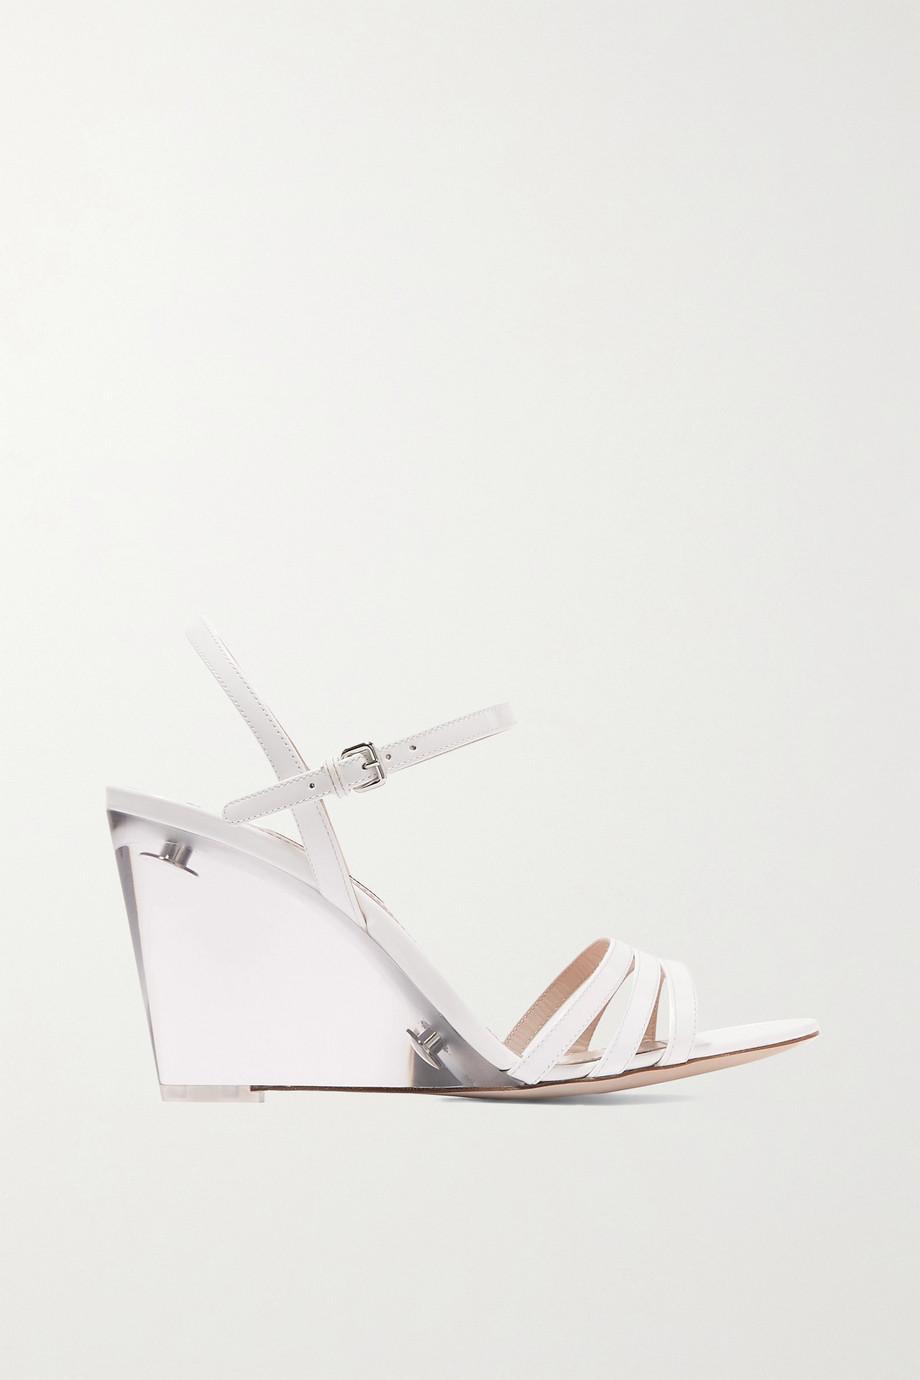 Miu Miu Perspex and leather wedge sandals